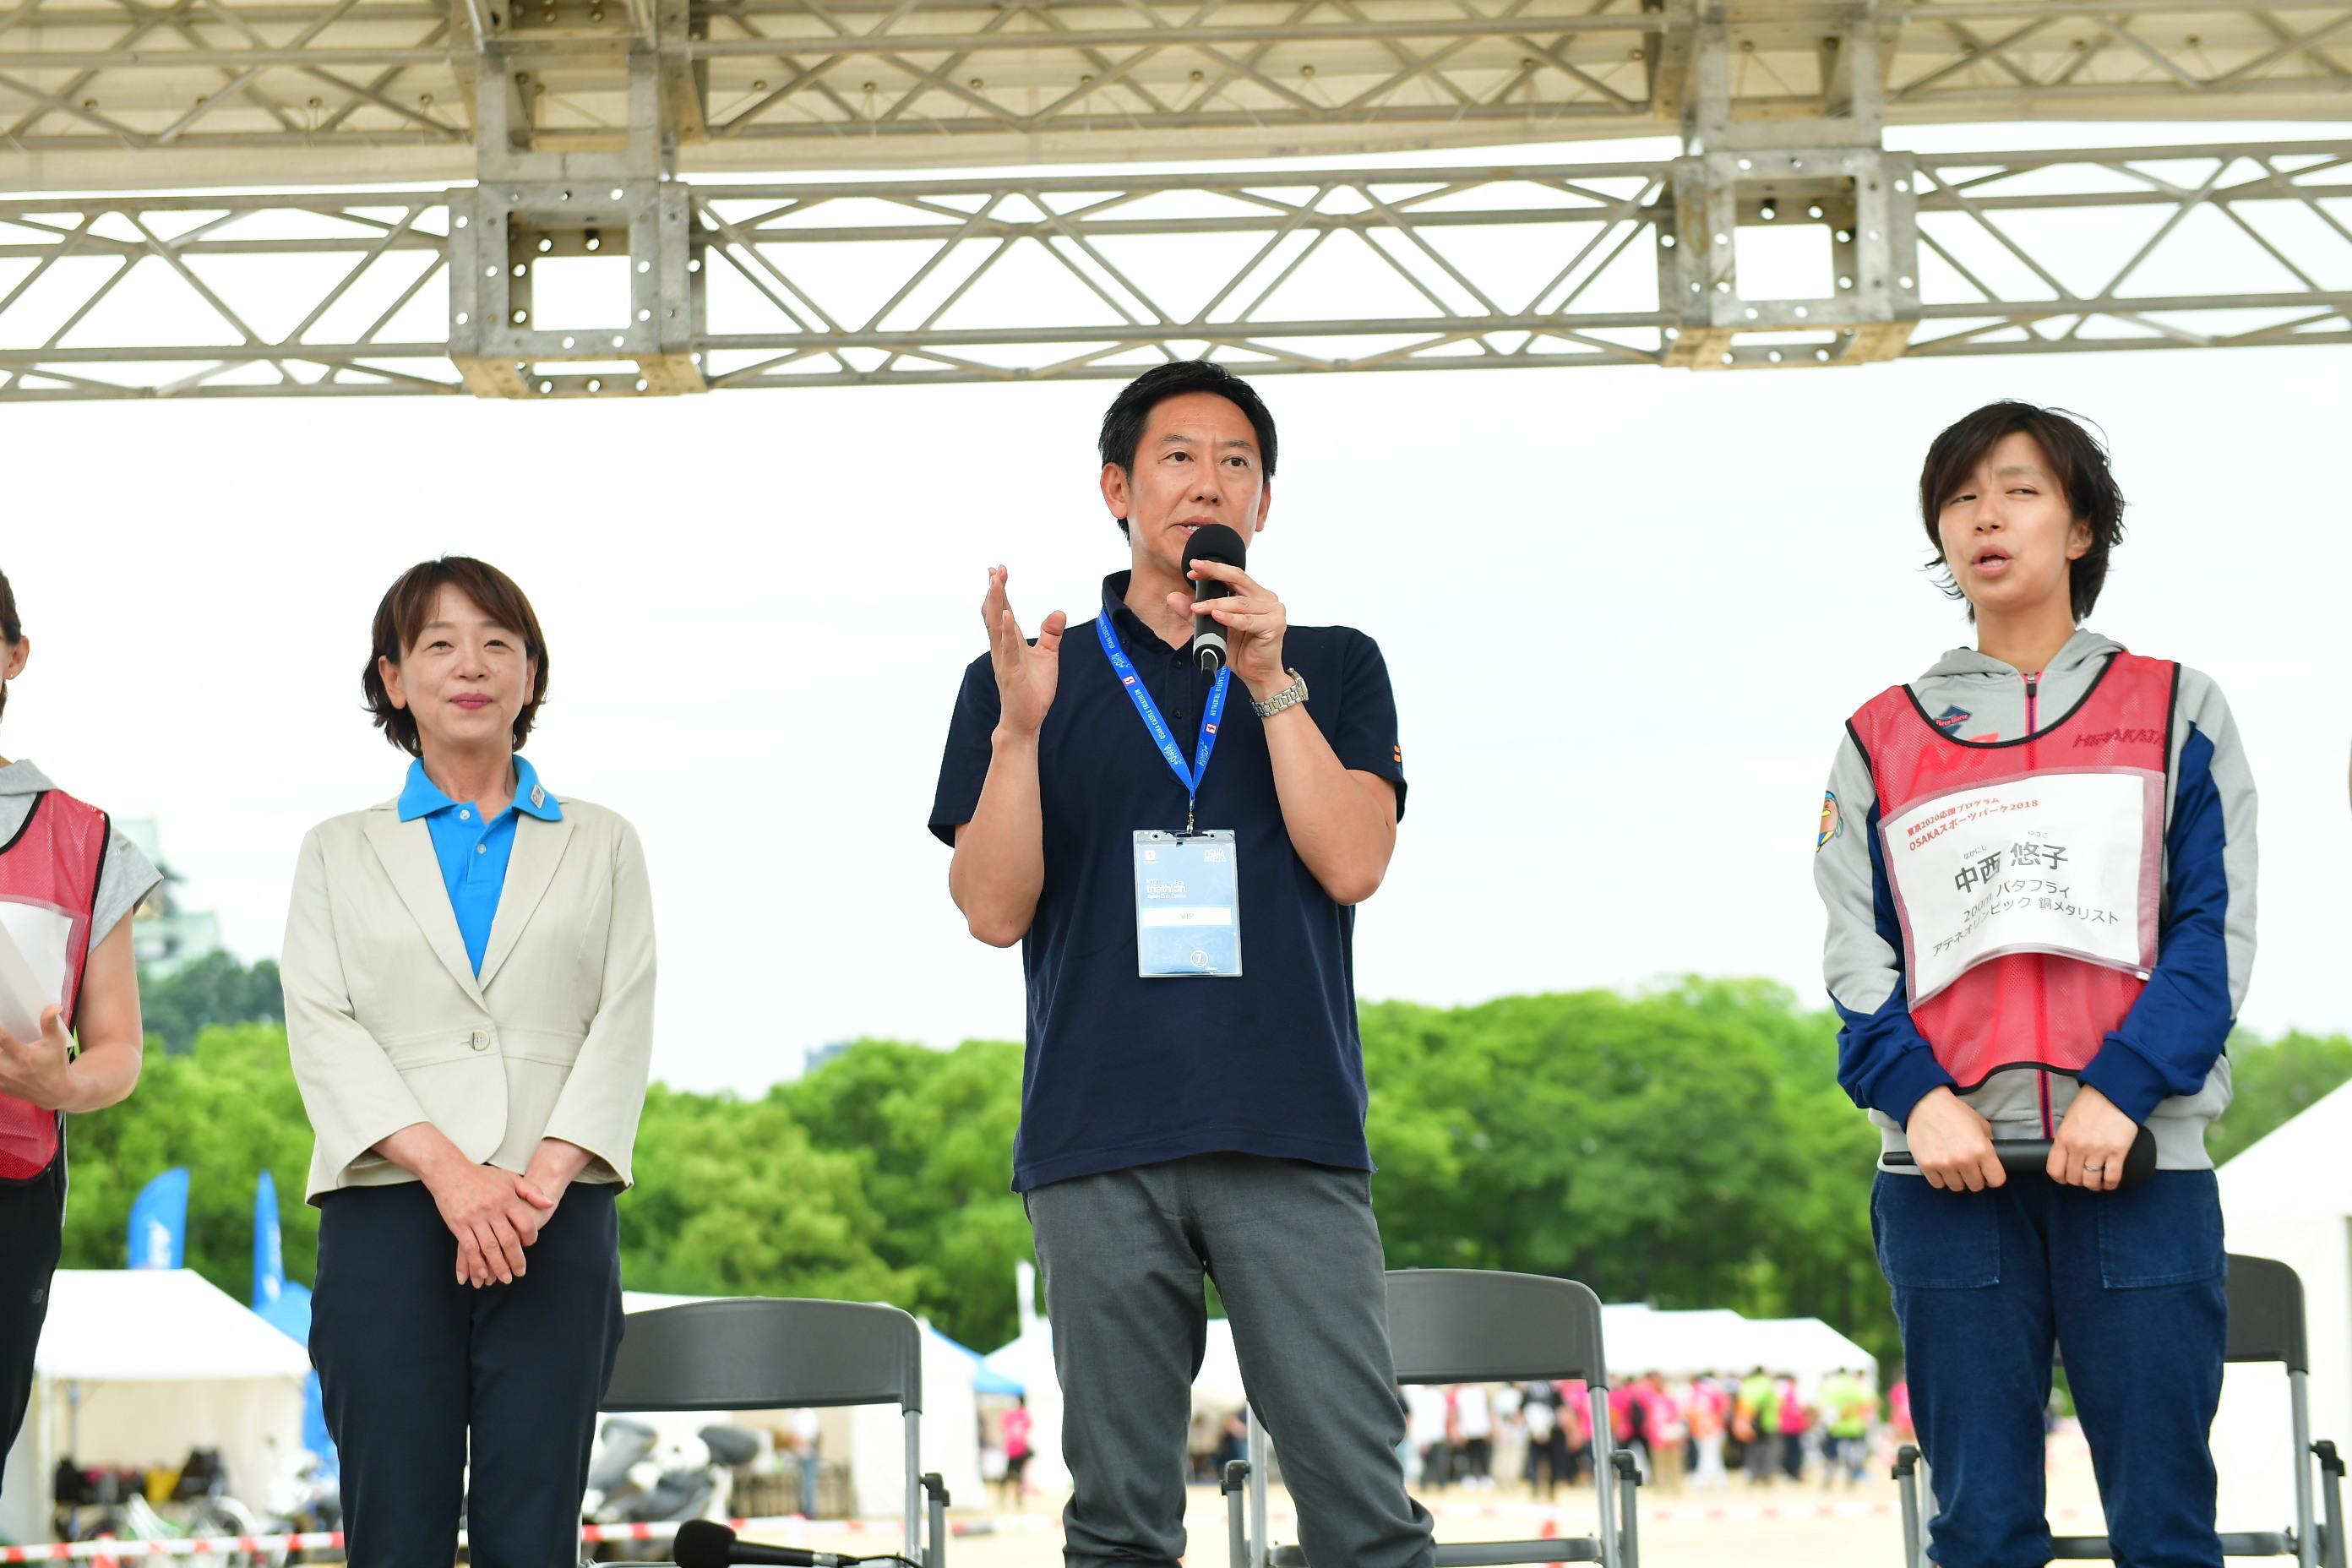 http://news.yoshimoto.co.jp/20180612161039-50c42e9e900aed7bd137e365f889e5da14292a3c.jpg